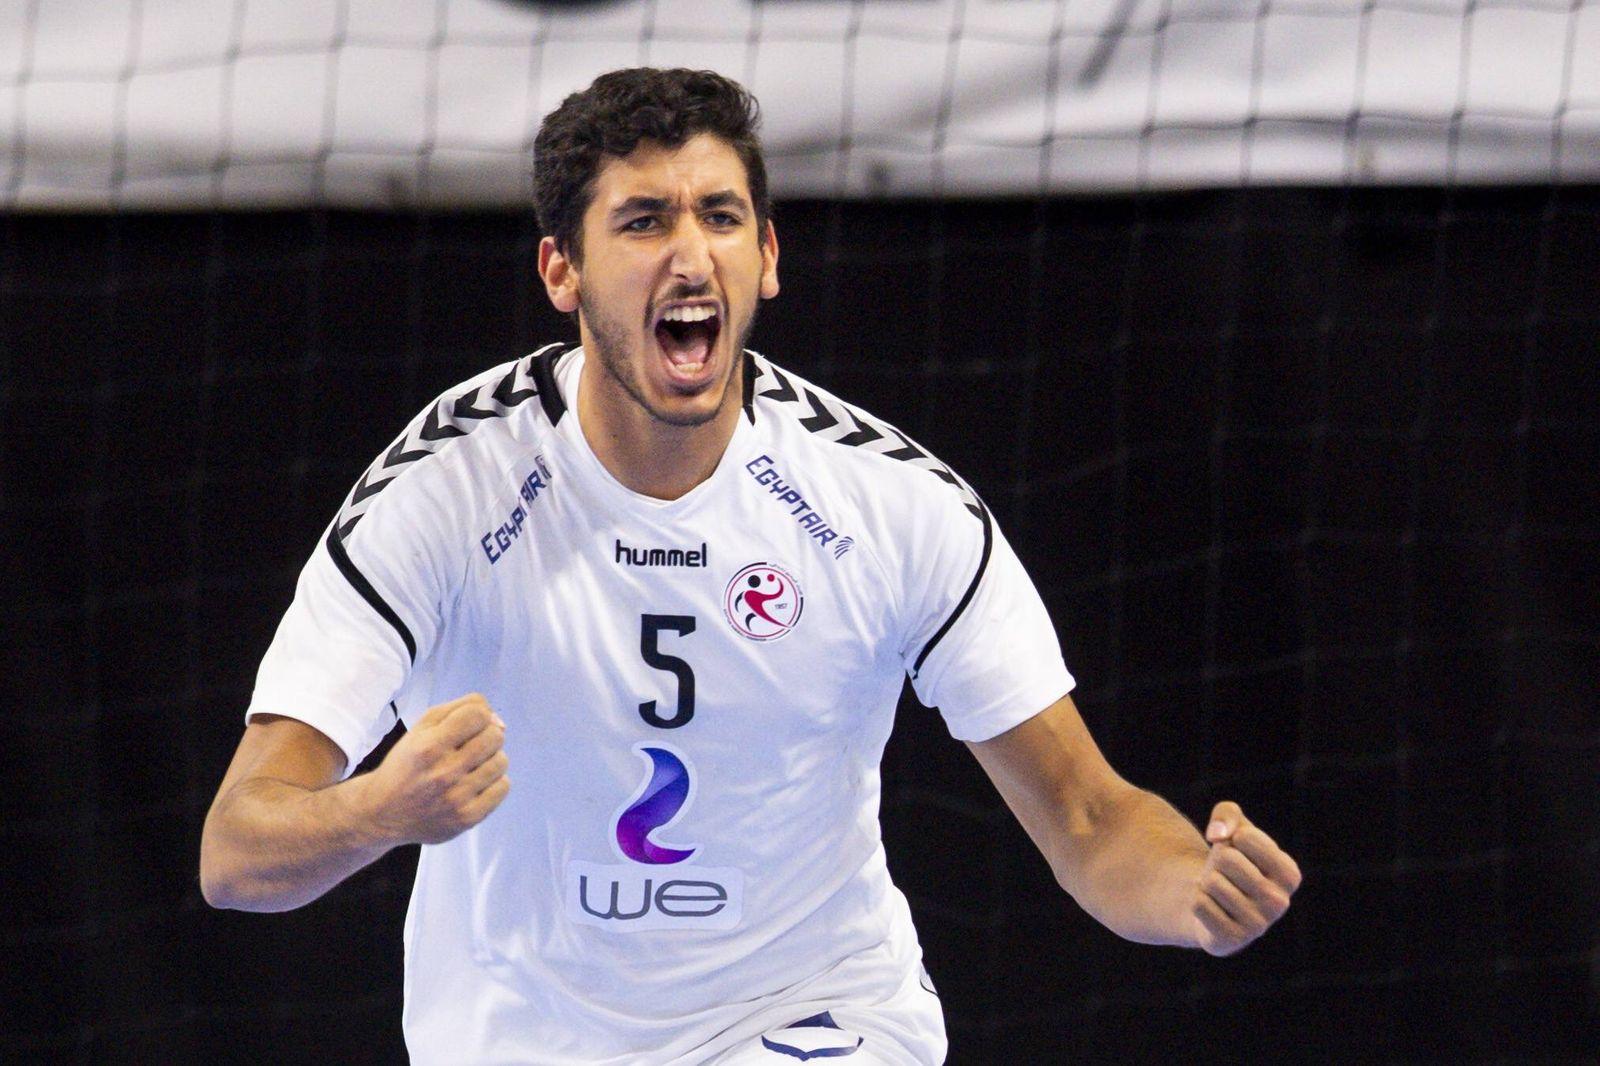 Handball WM Ungarn Ägypten 190116 Yahia Omar of Egypt celebrates during the IHF World Handball Ch